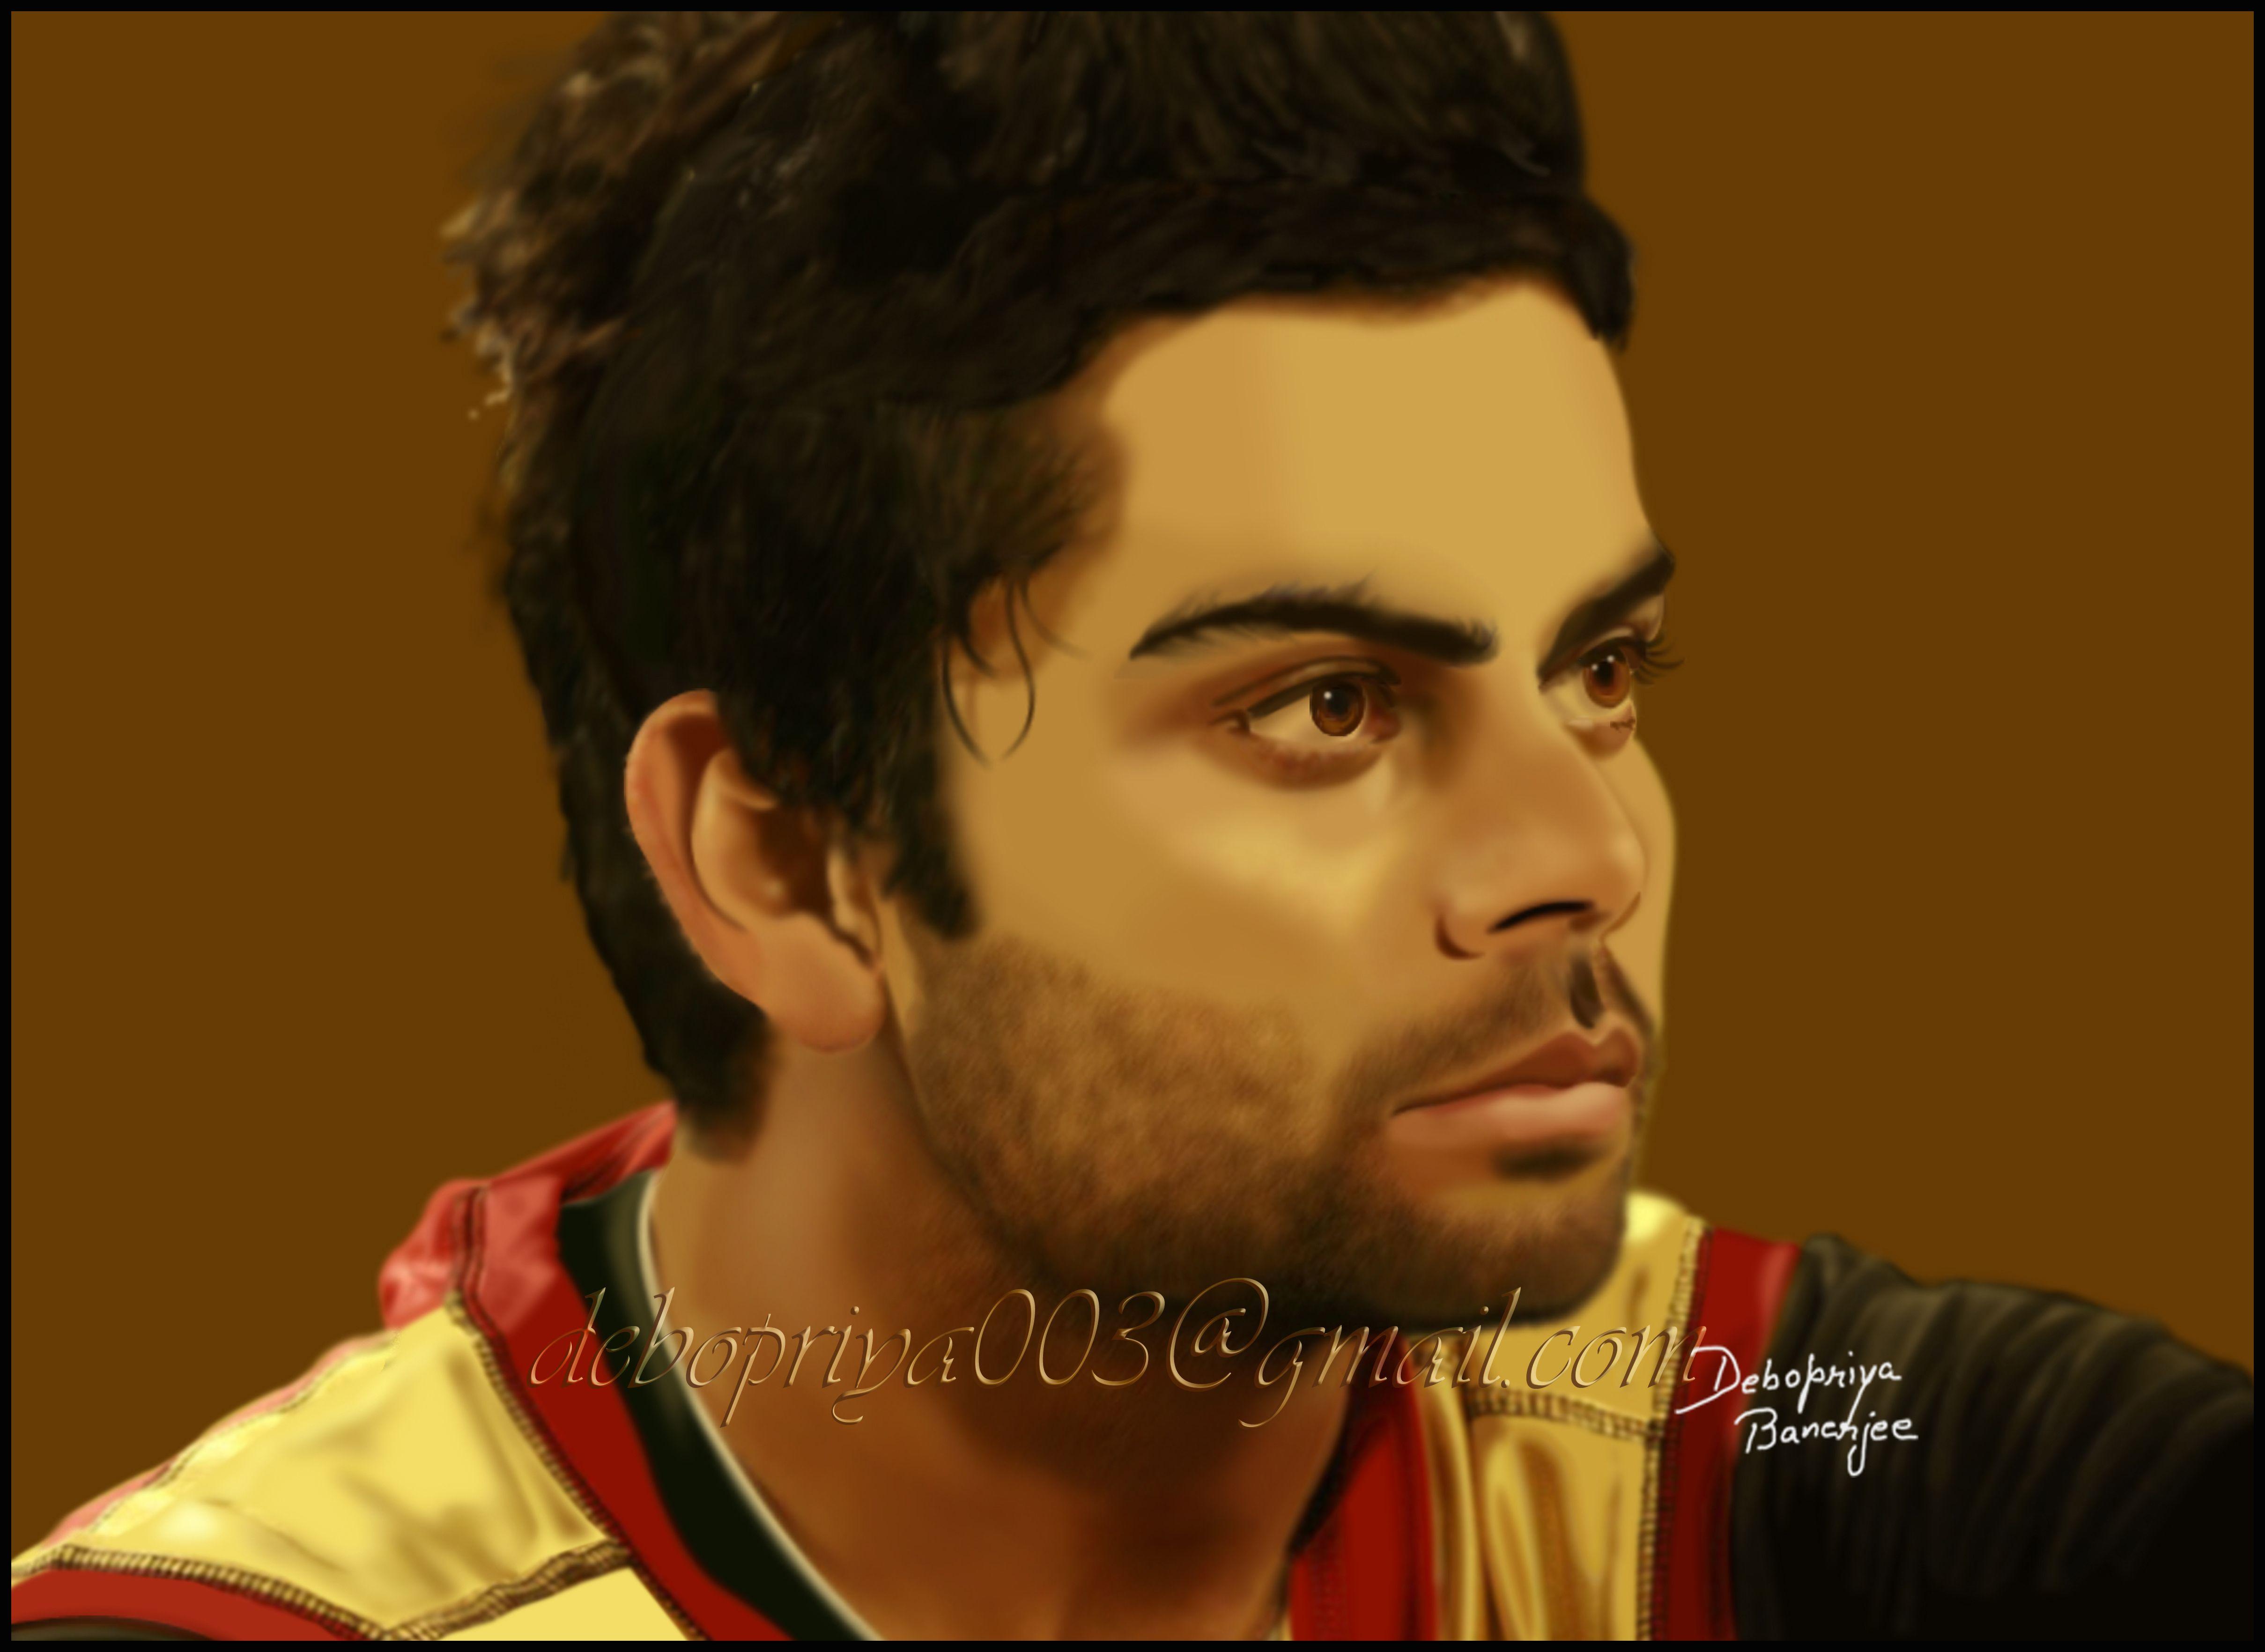 Digital painting of Virat Kohli....done by me